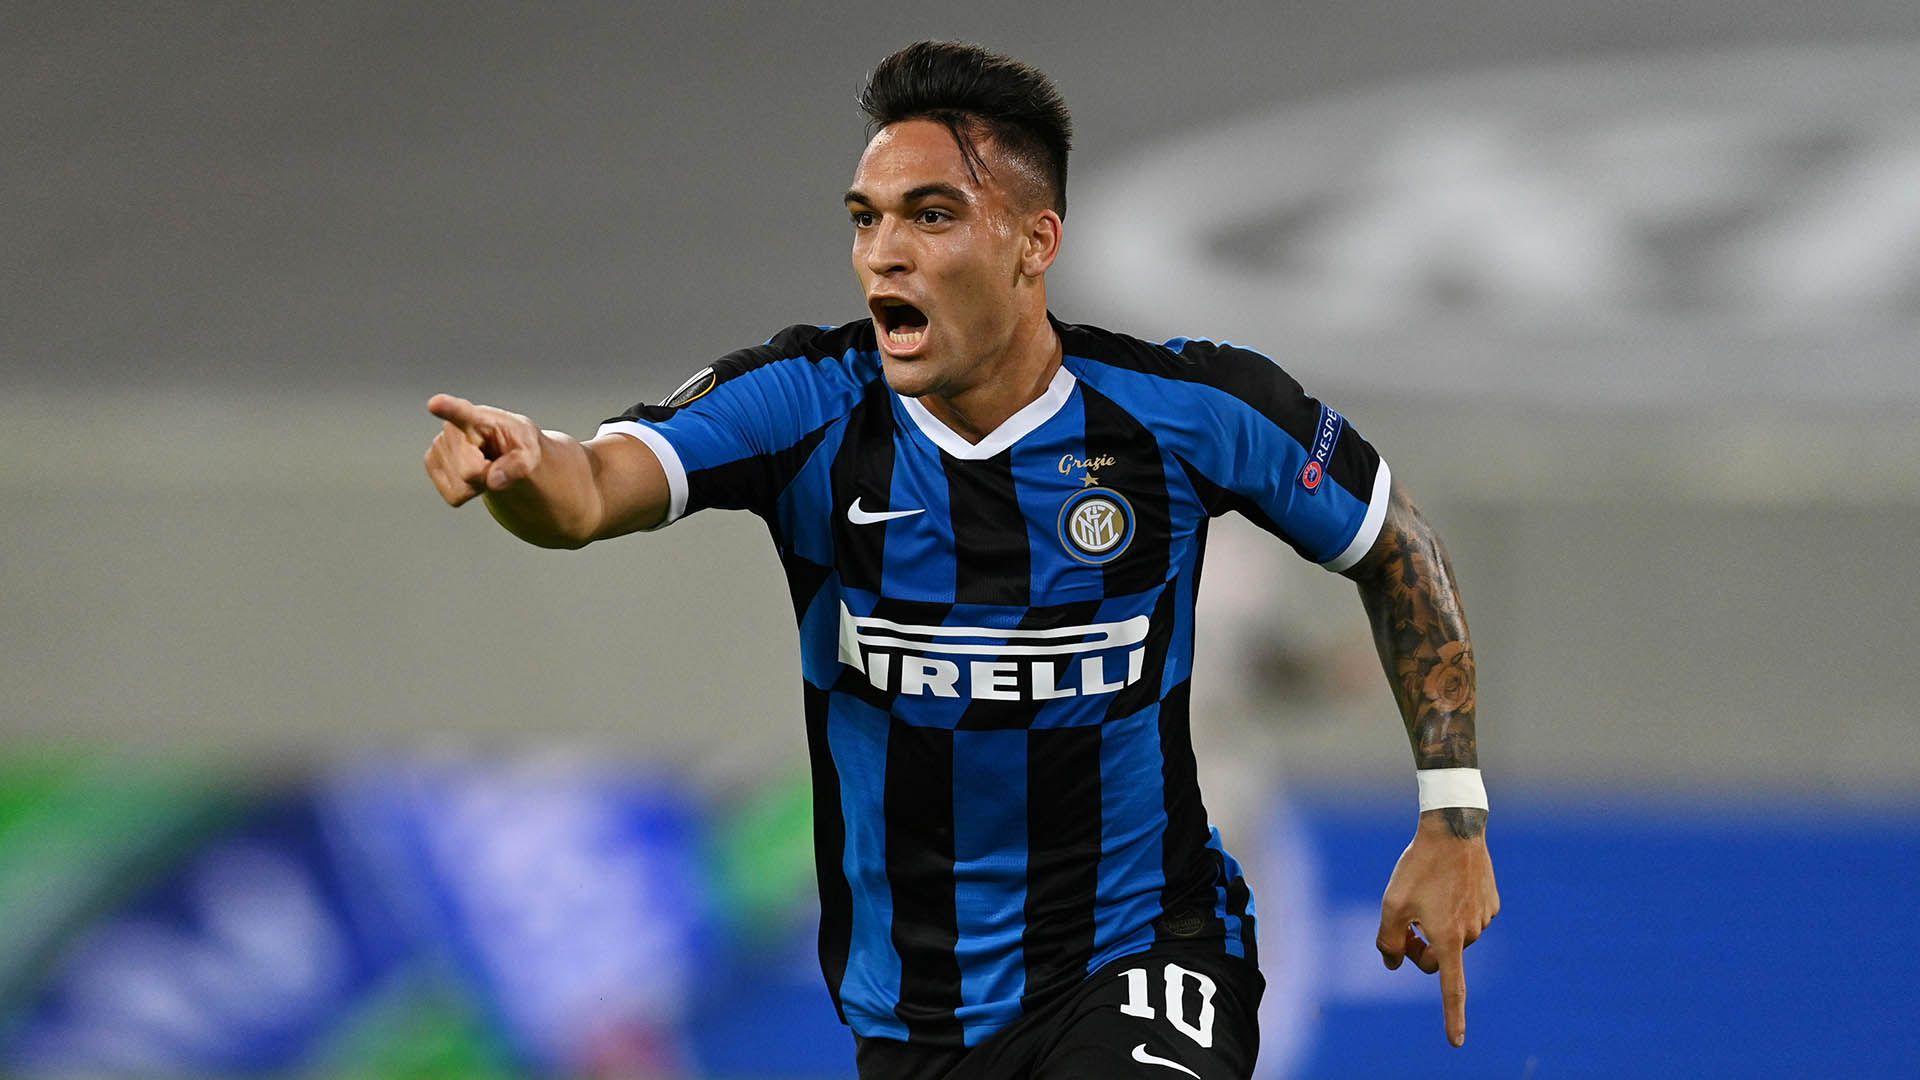 Europa League - Semi Final - Inter Milan v Shakhtar Donetsk